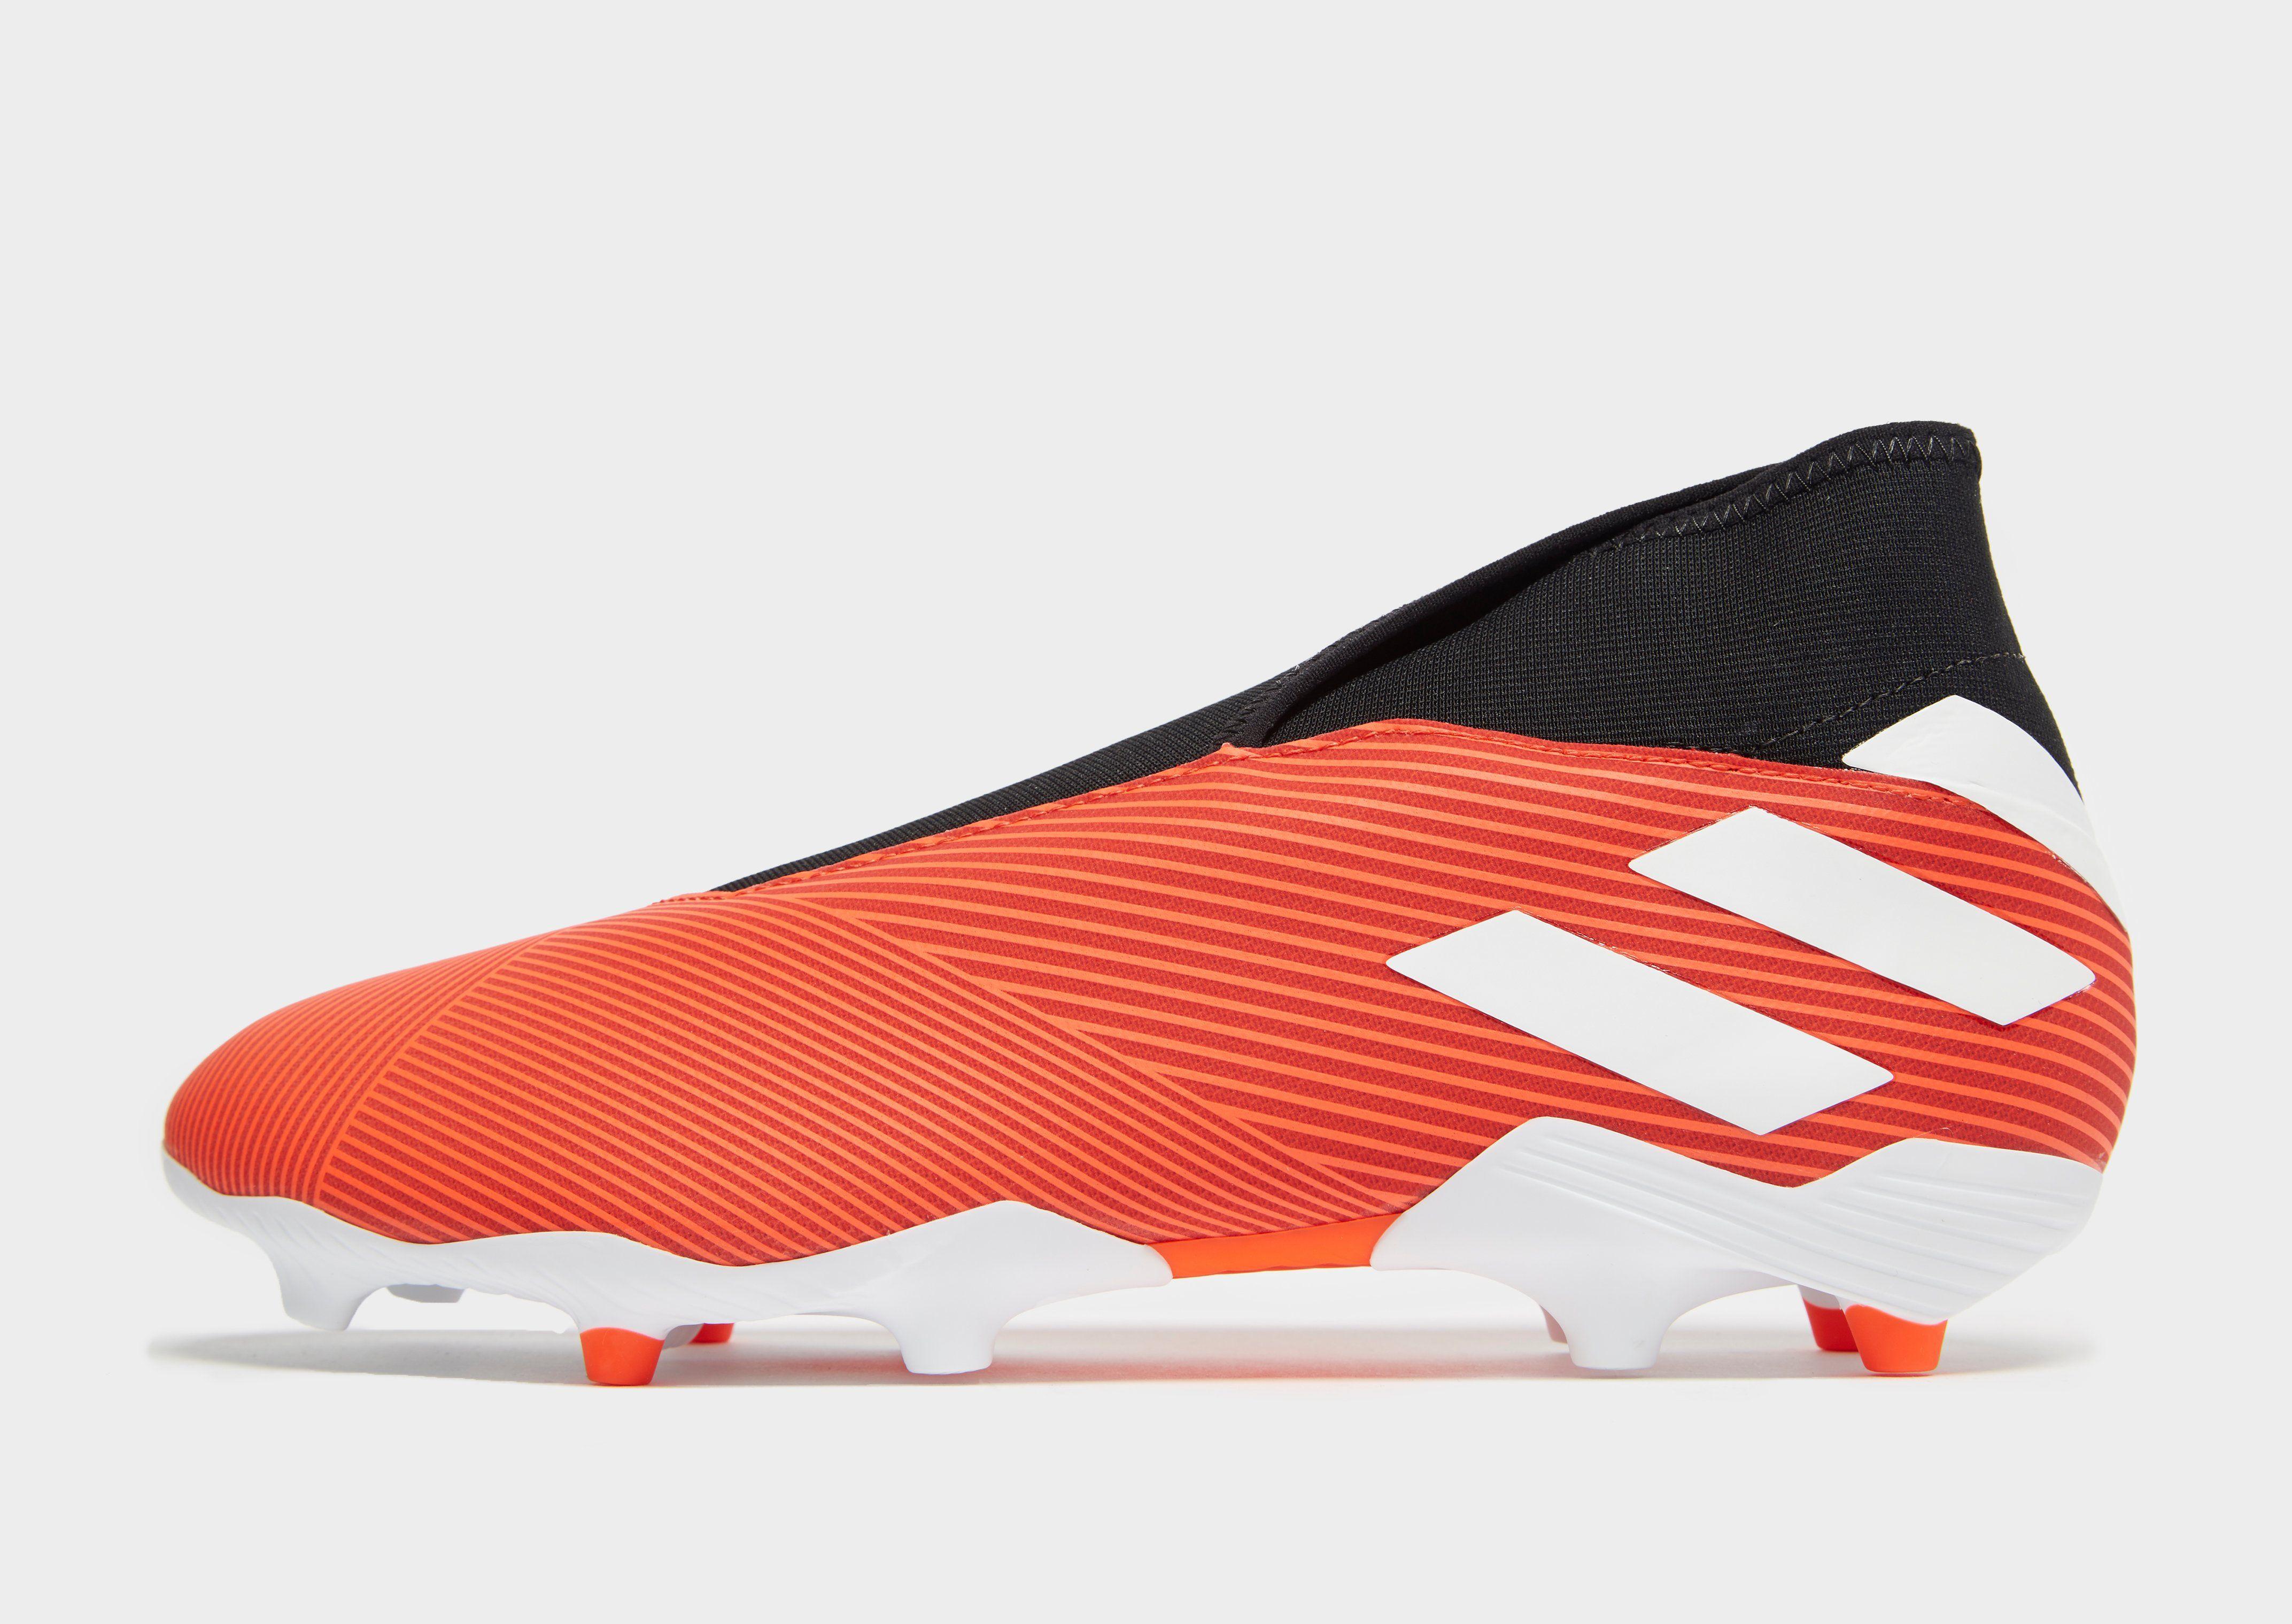 61d236fa6c32 adidas Performance Nemeziz 19.3 Firm Ground Boots | JD Sports